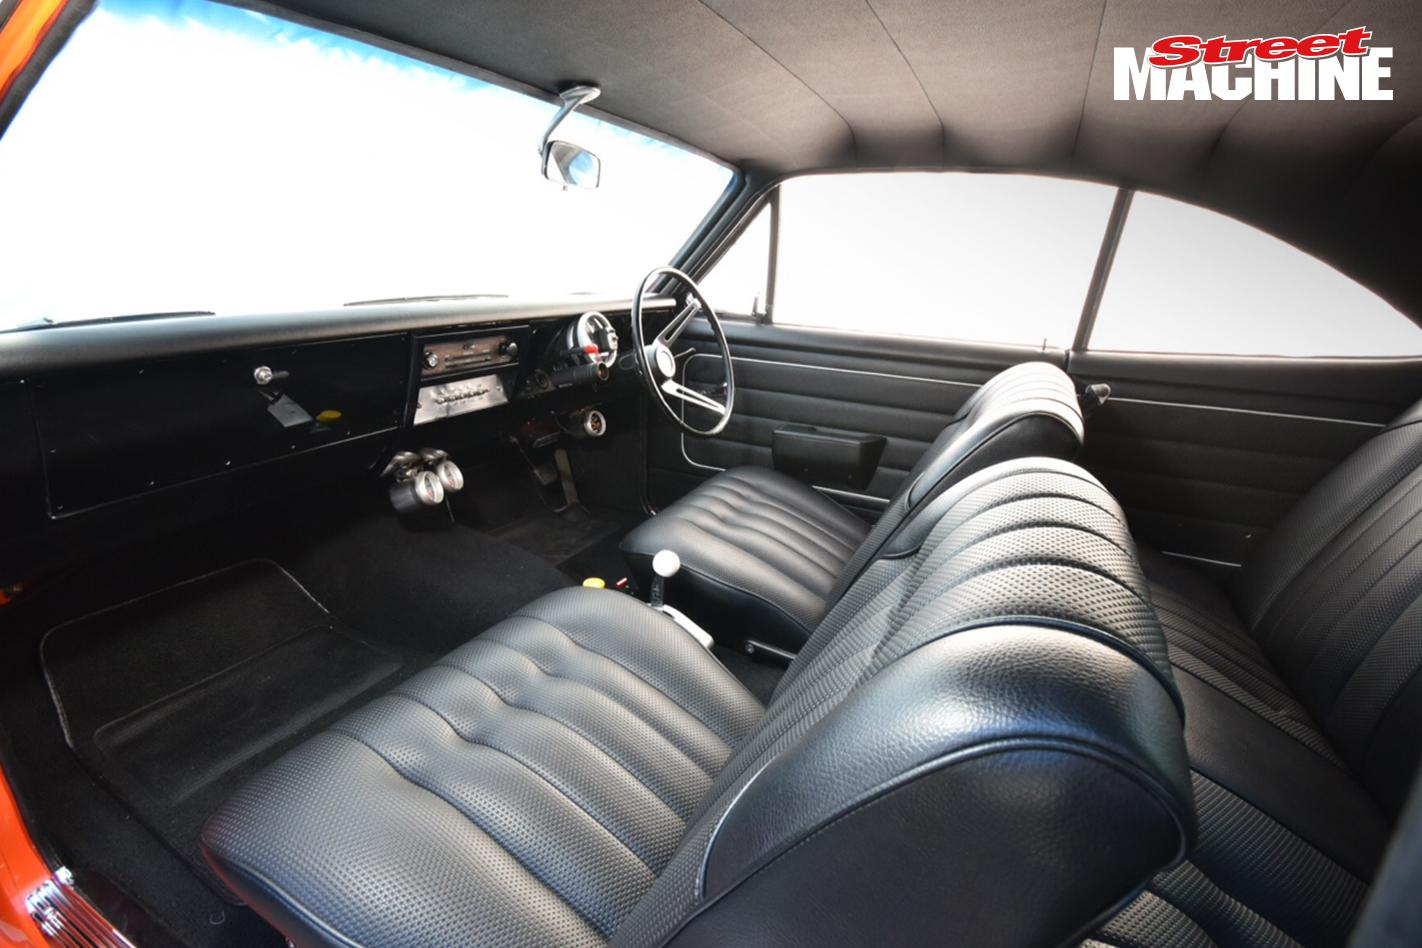 HG Holden Monaro 427 4 Nw